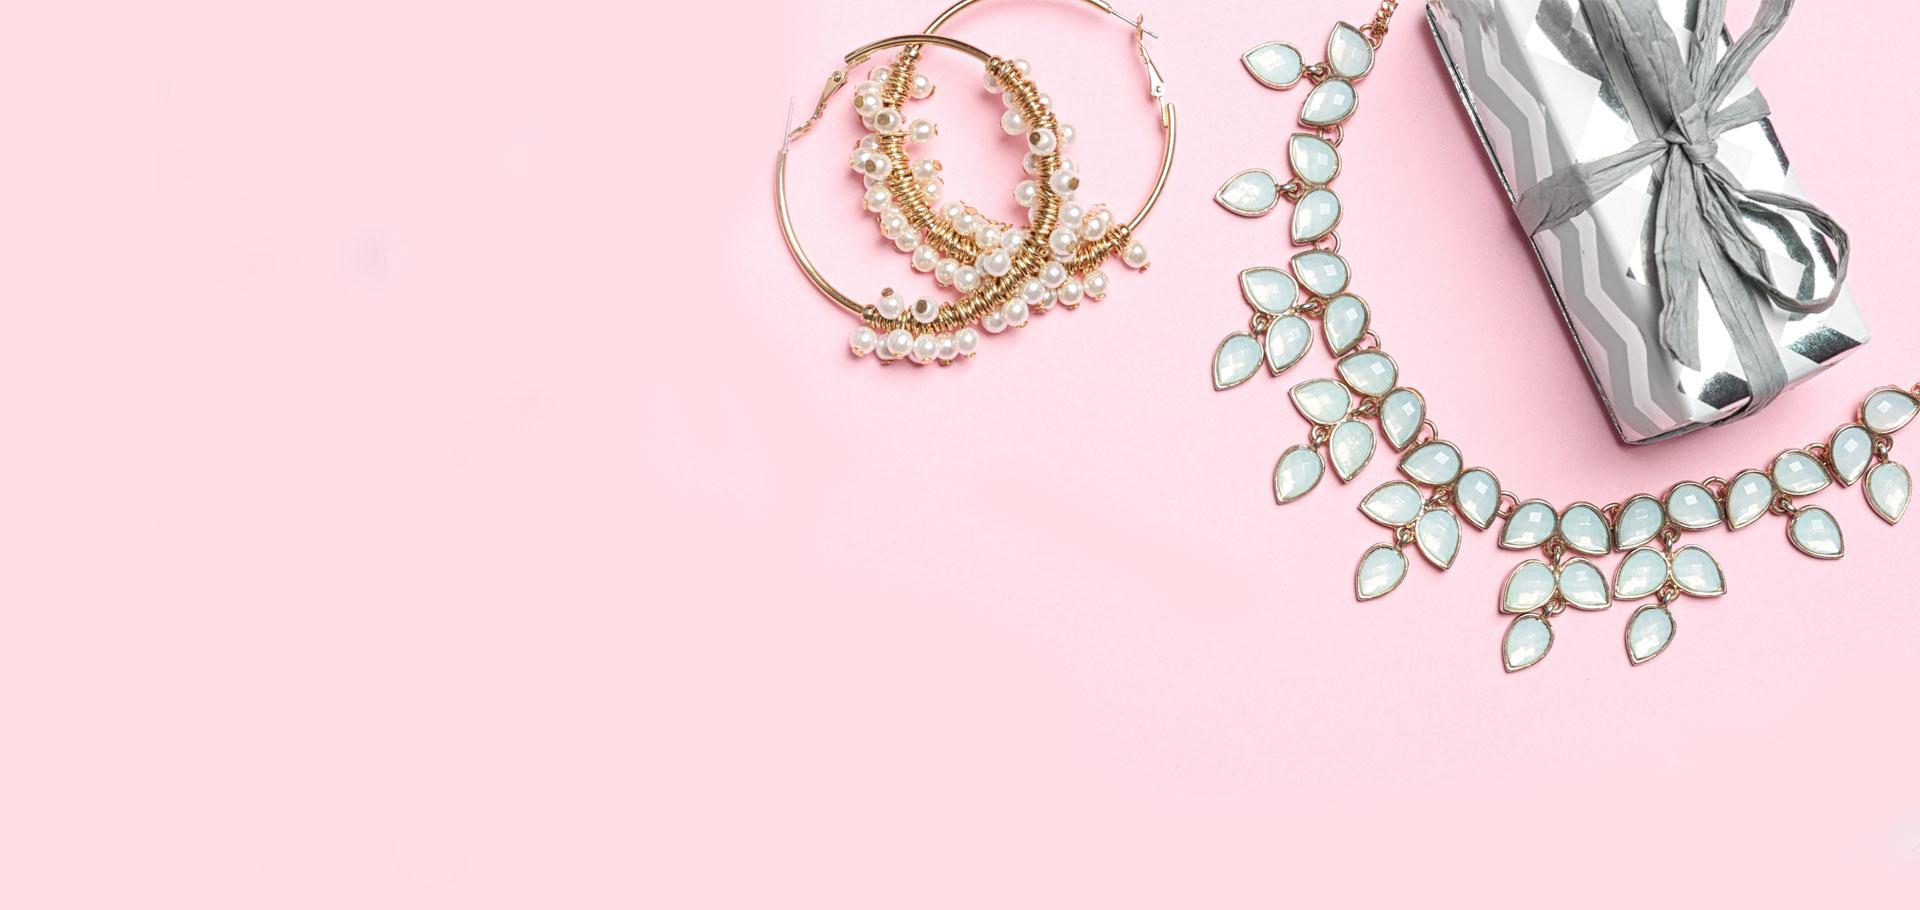 Choisir & assortir ses bijoux